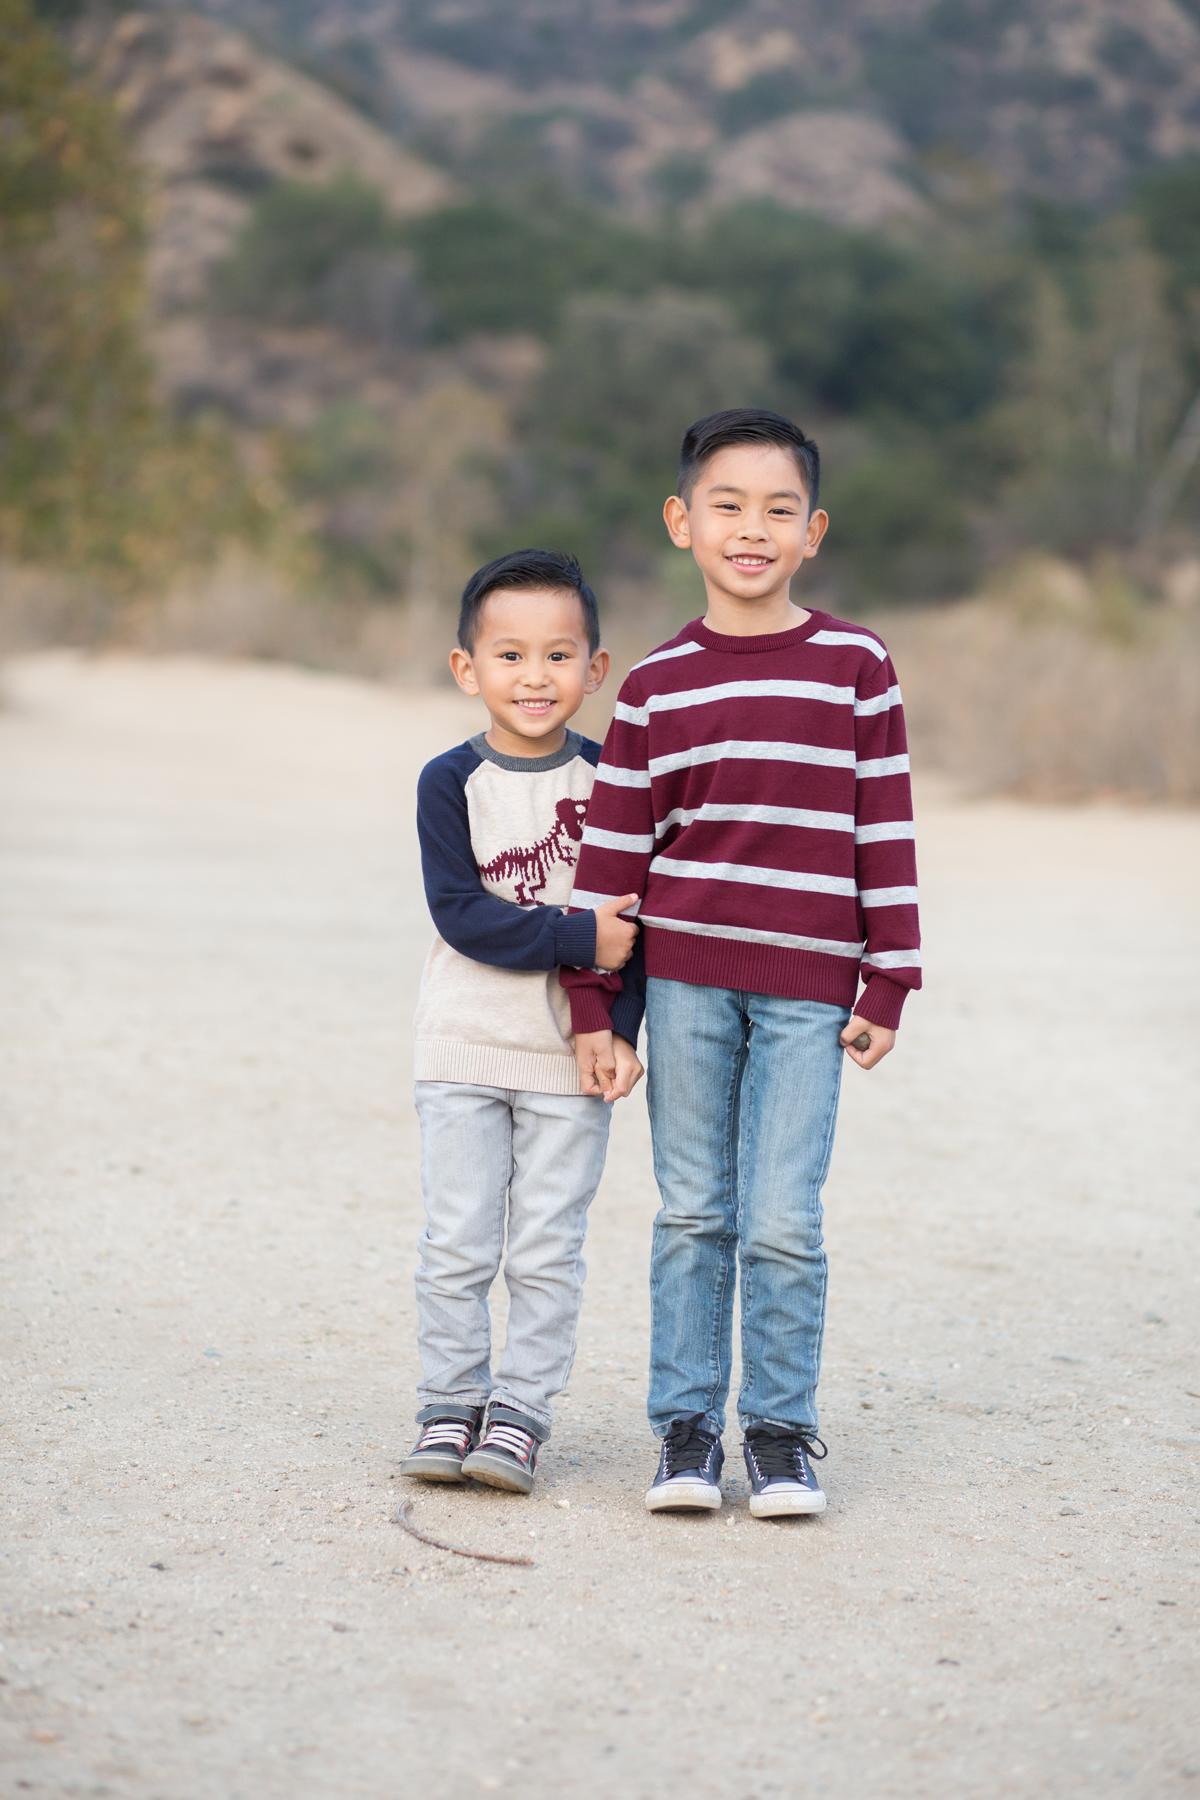 pasadenafamilyphotographer_dieps010